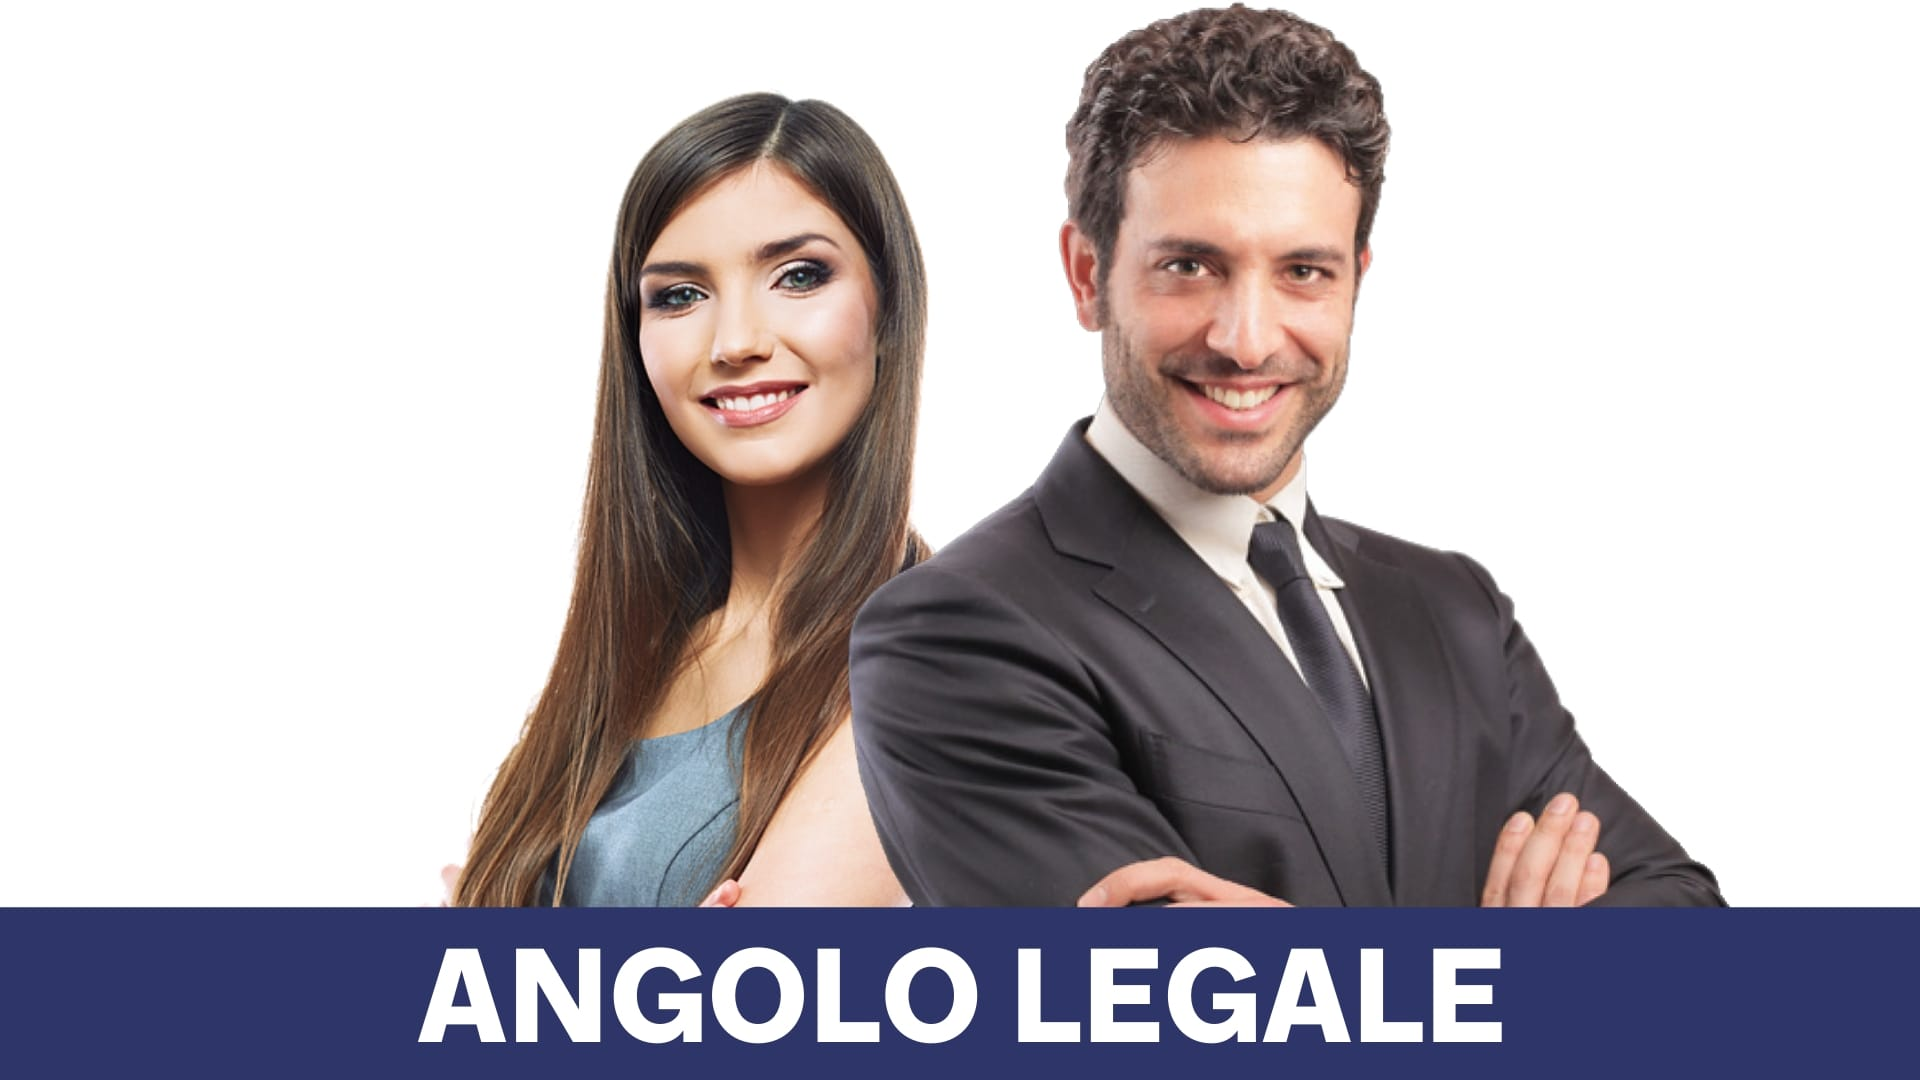 Angolo Legale FIAP  v15